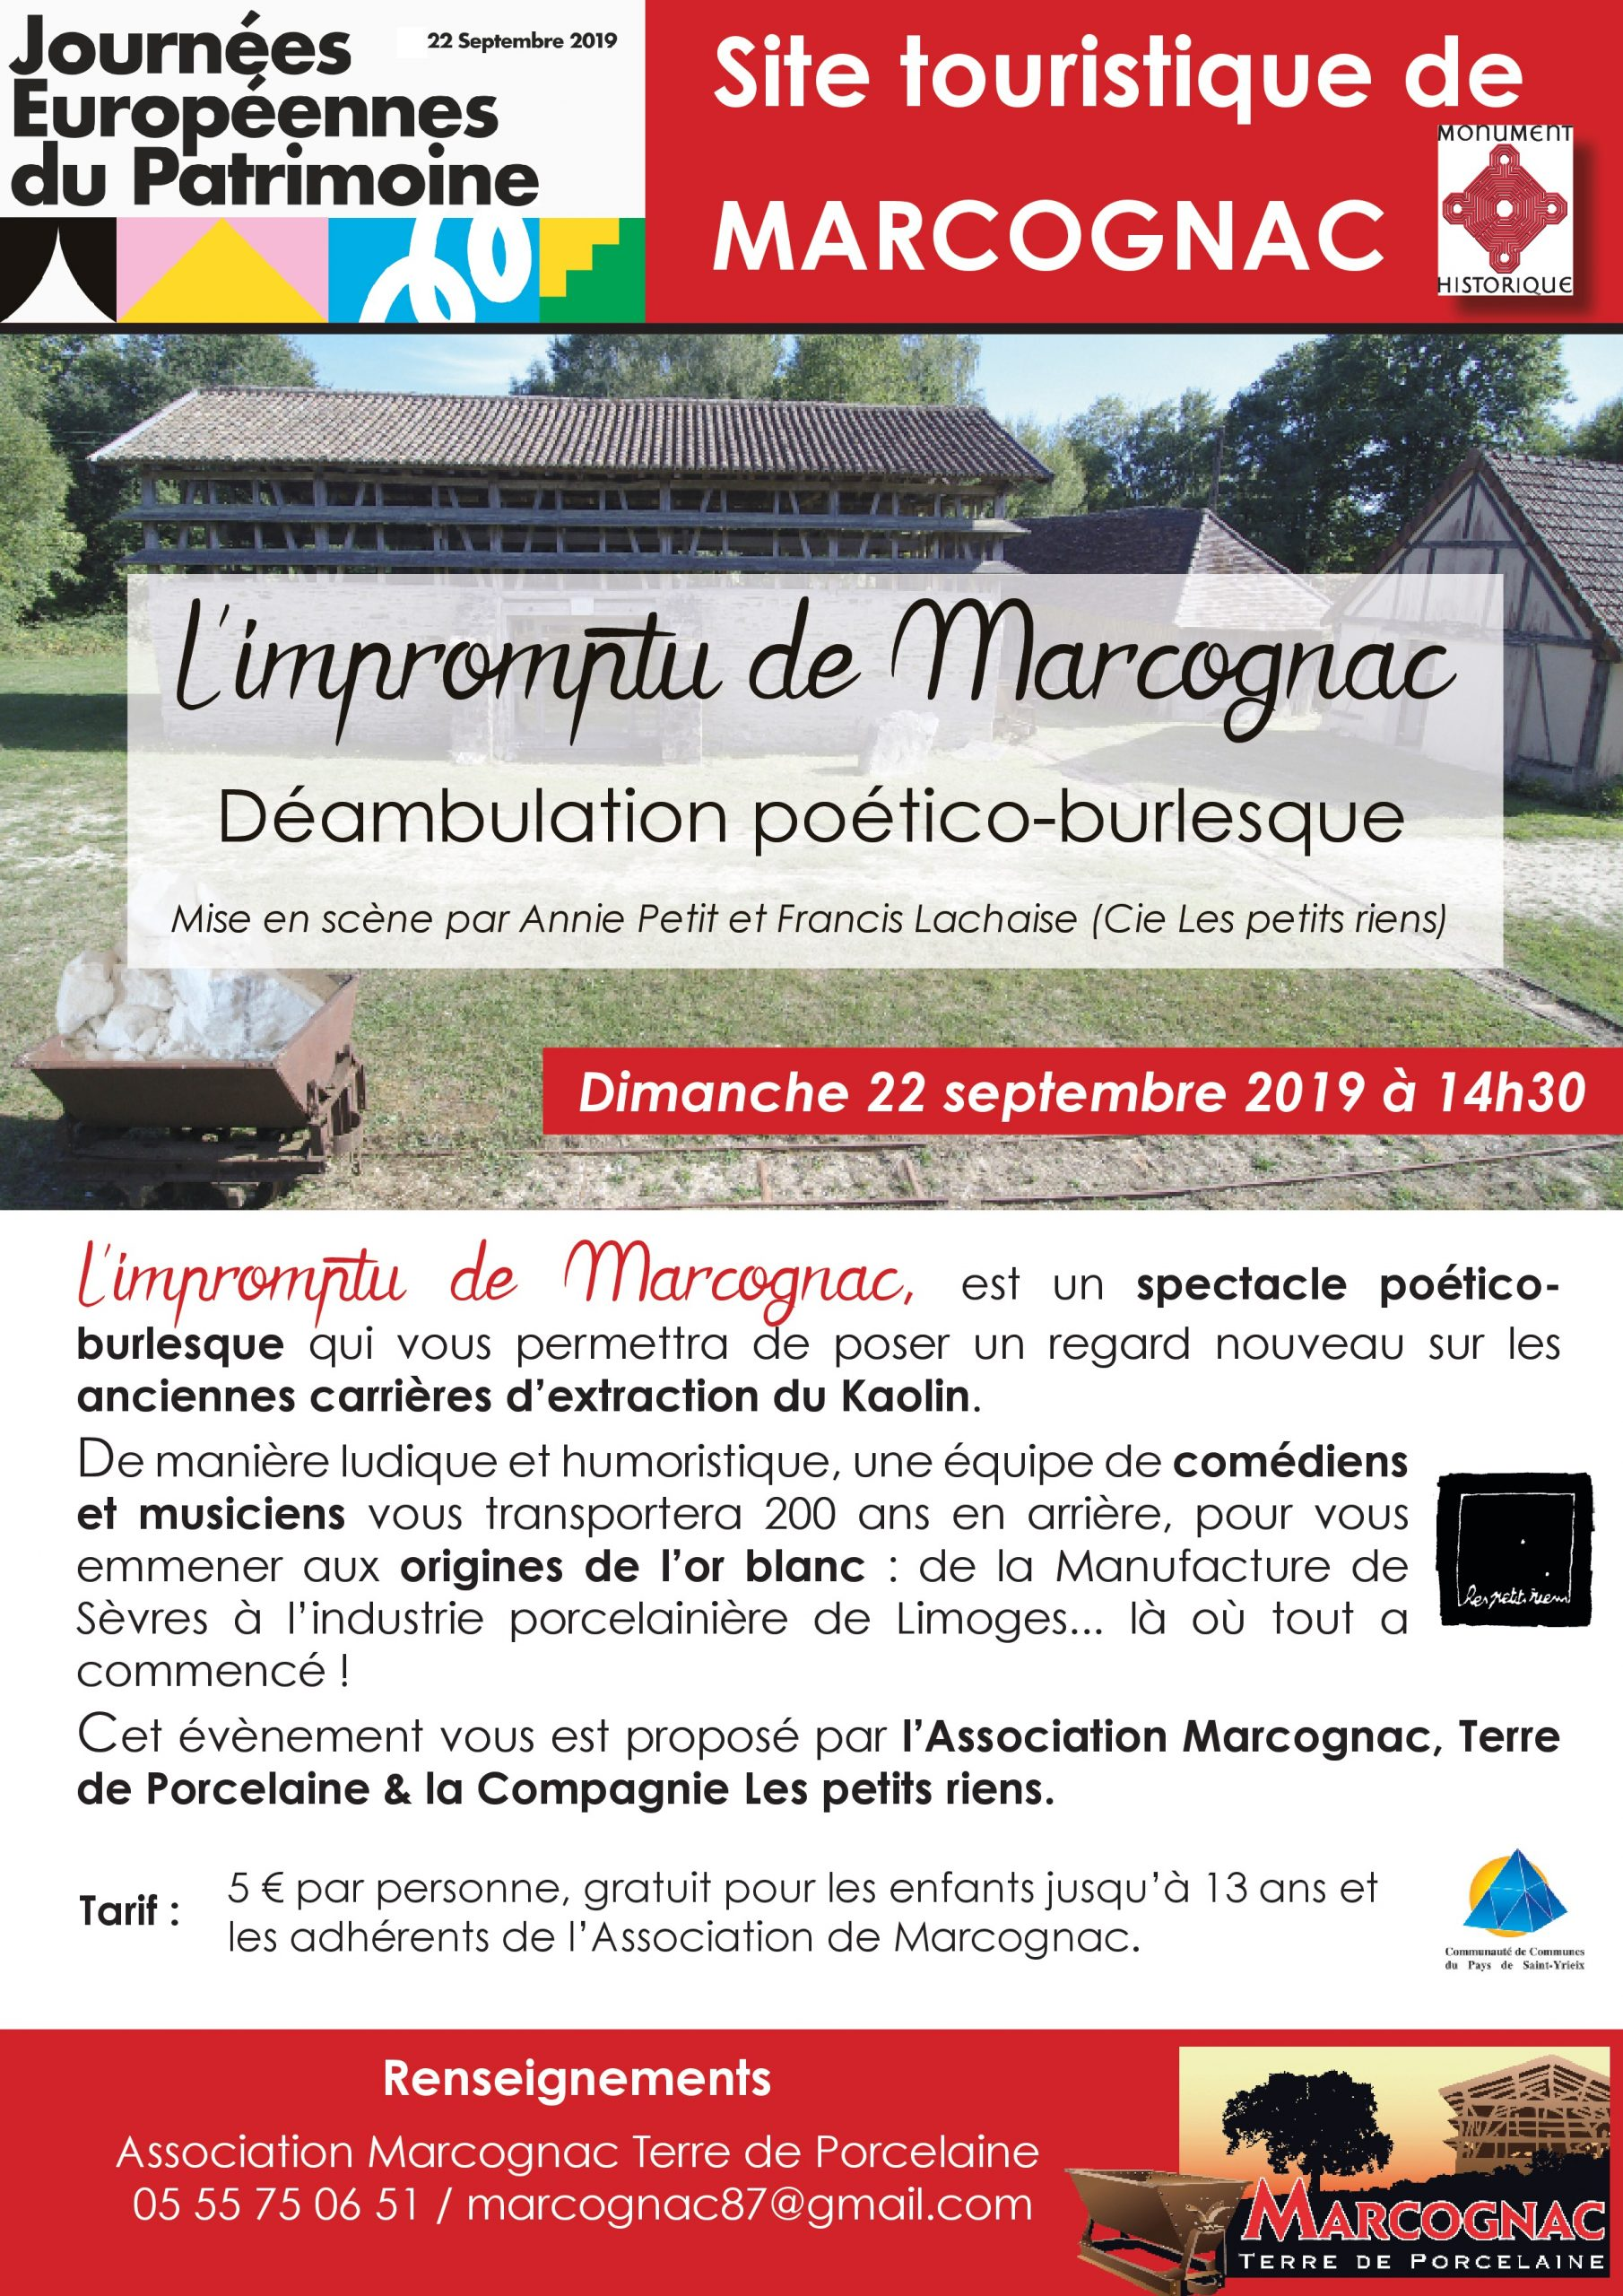 L'impromptu de Marcognac